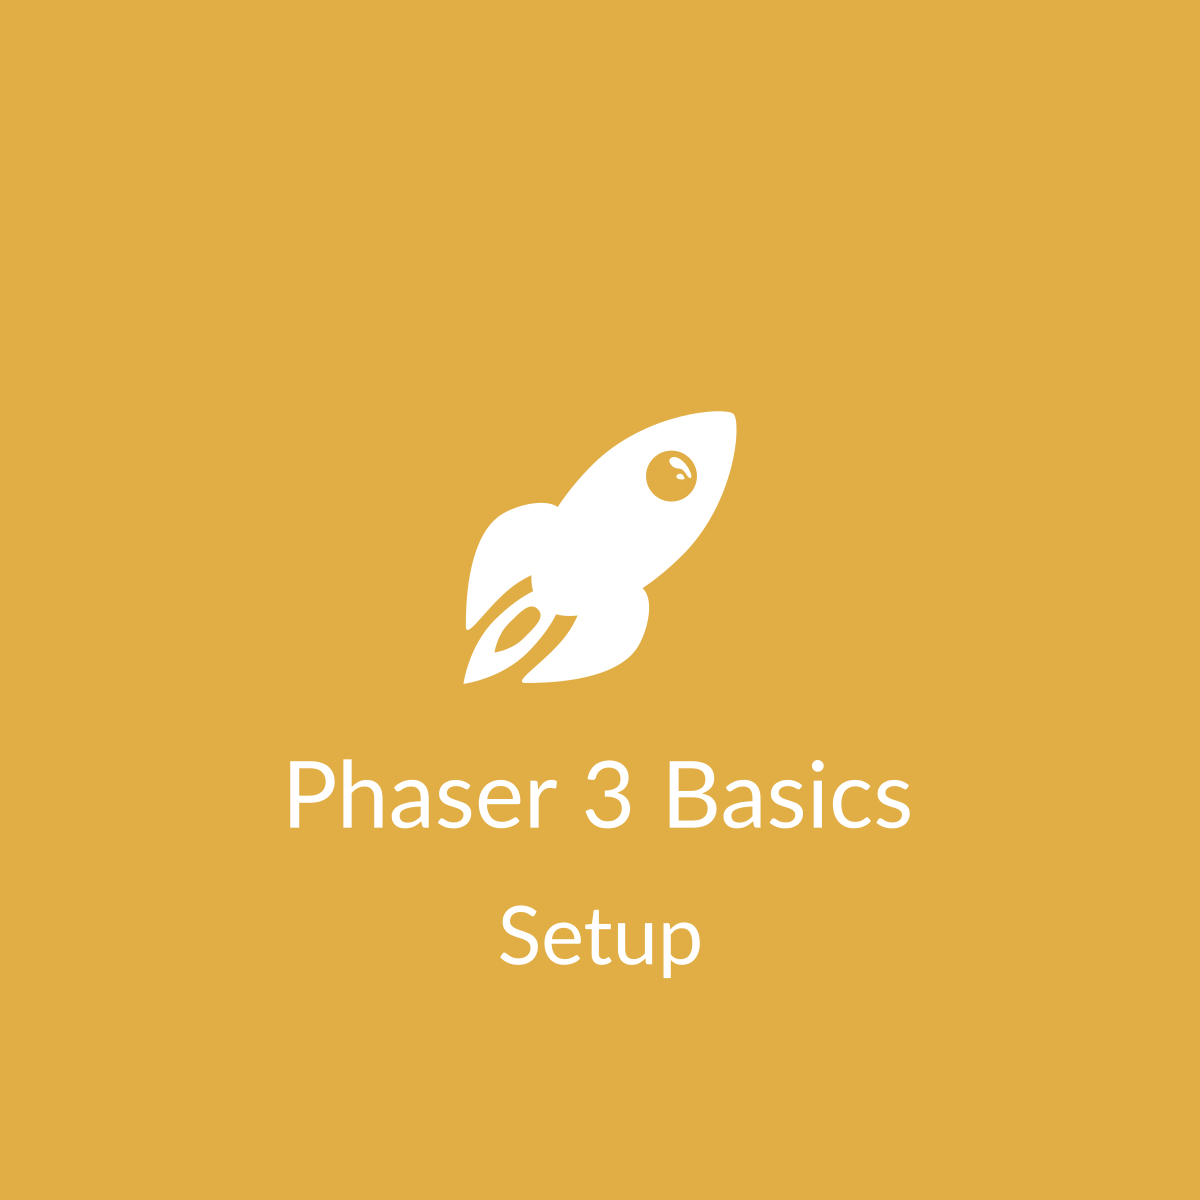 Phaser 3 Basics: Setup